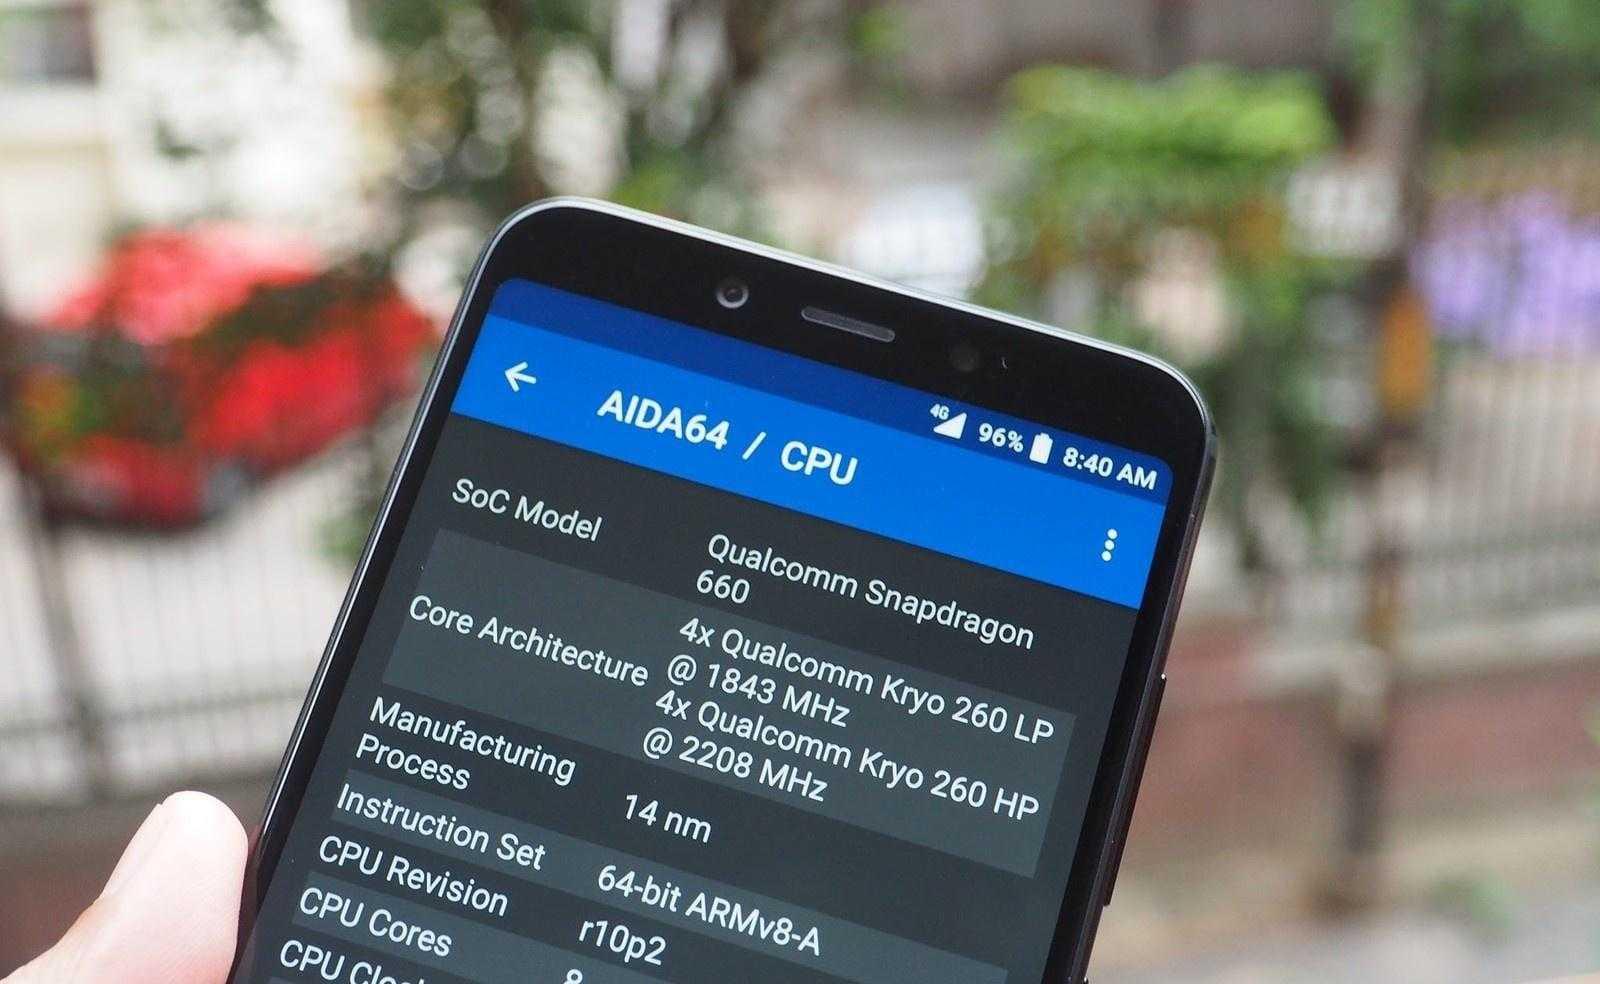 ТОП-5 причин купить Xiaomi Mi A2 (xiaomi mi a2 8 e1532515783897)